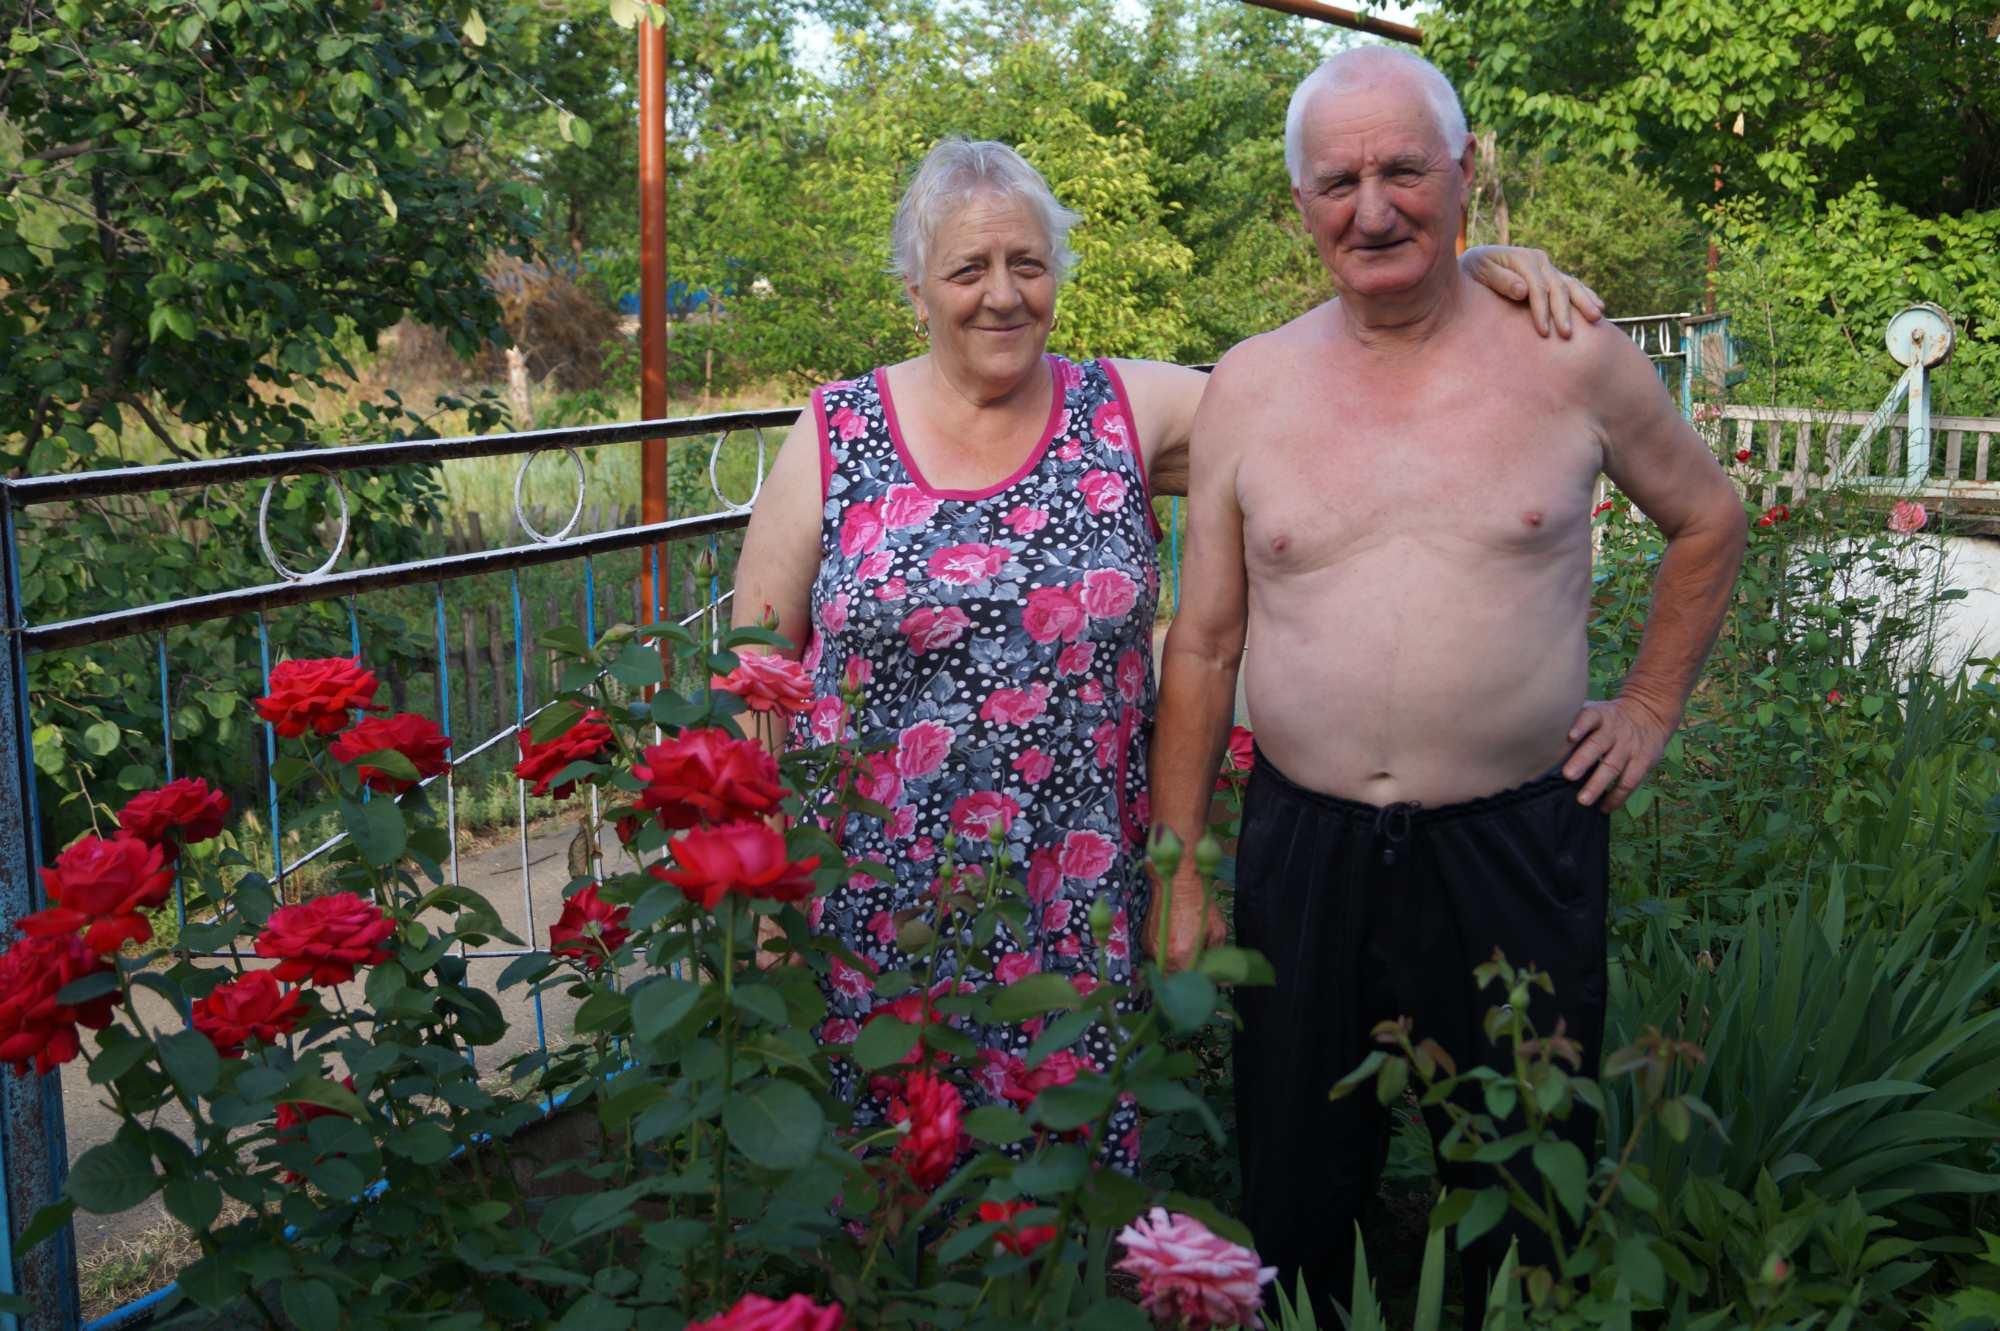 Стоячий член дедули фото 24 фотография